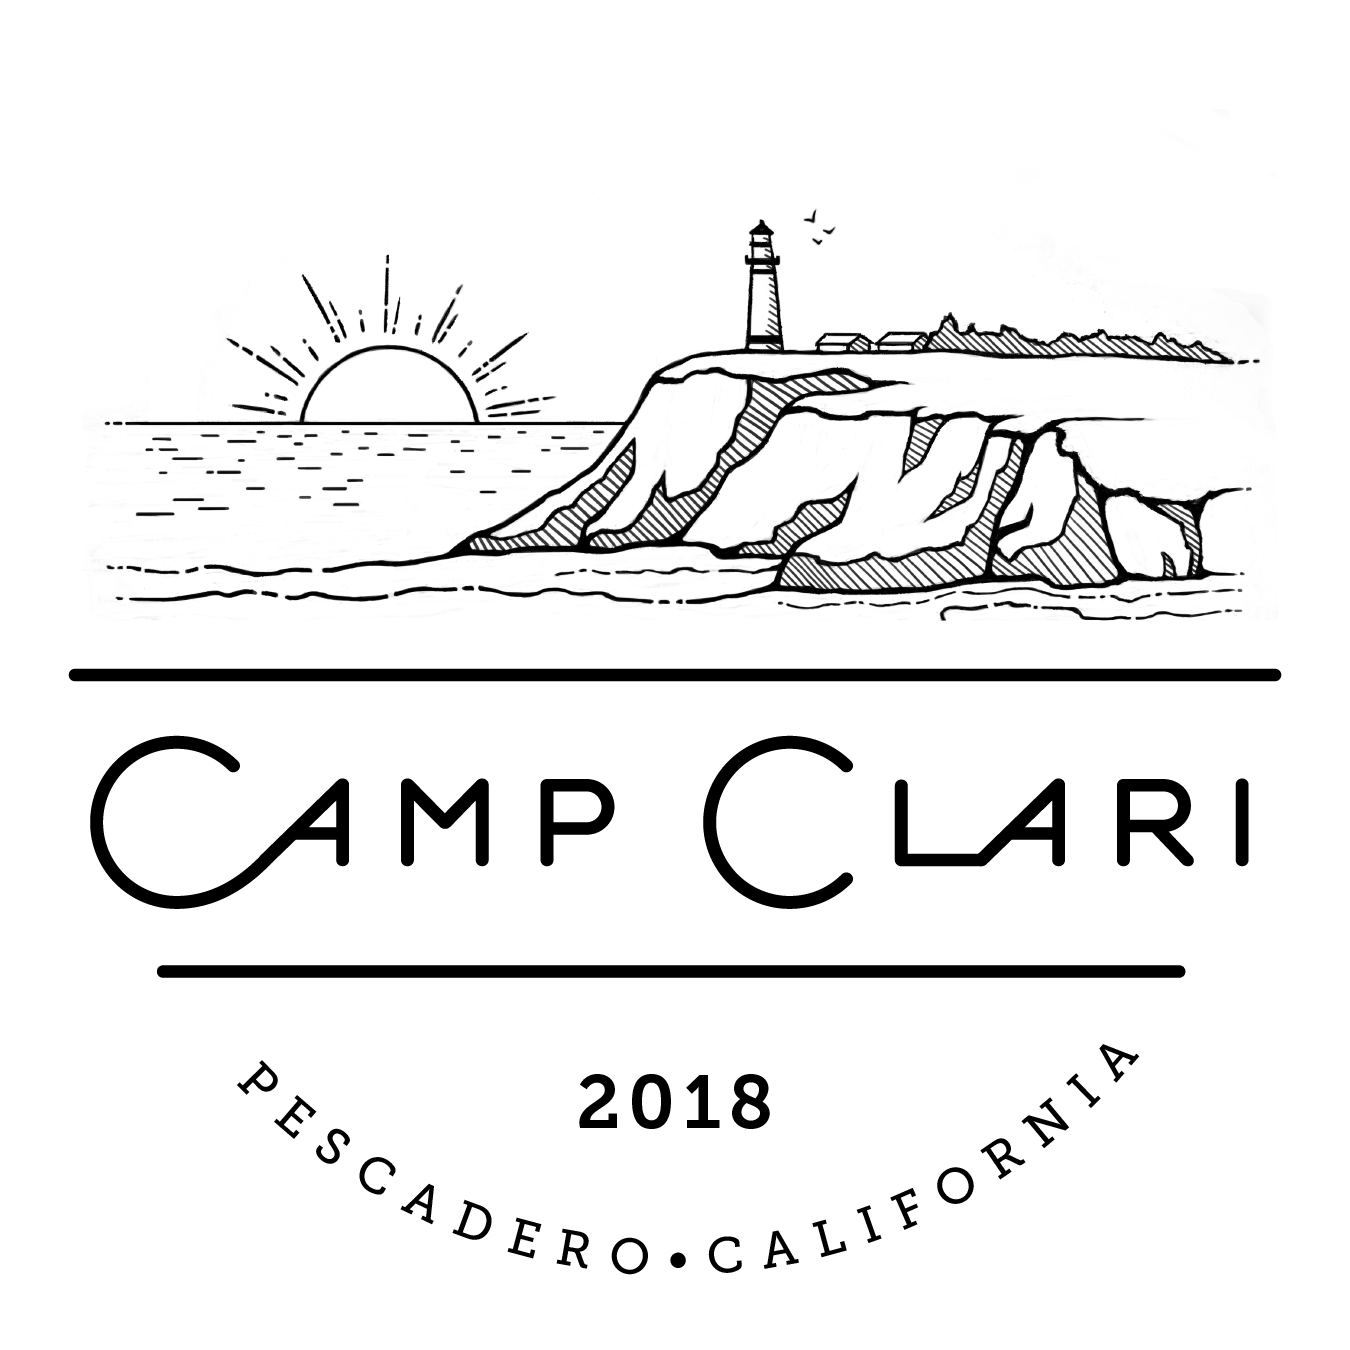 campclari_logos-01.png